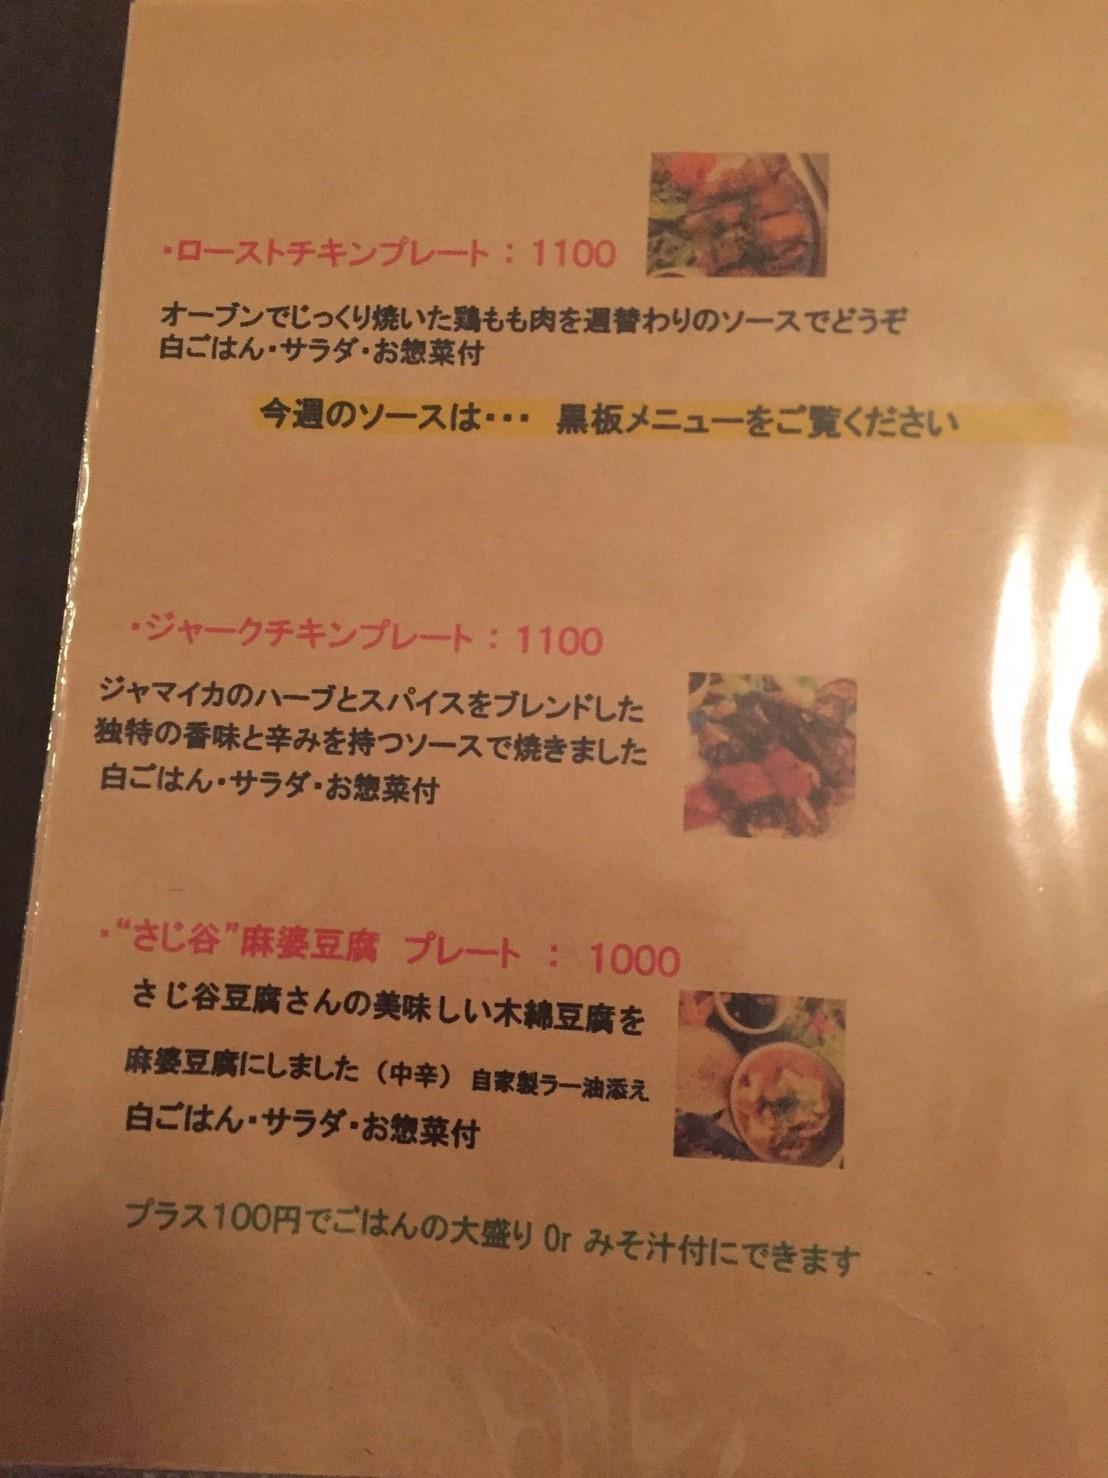 TAO CAFE にて夕食_e0115904_02280686.jpg